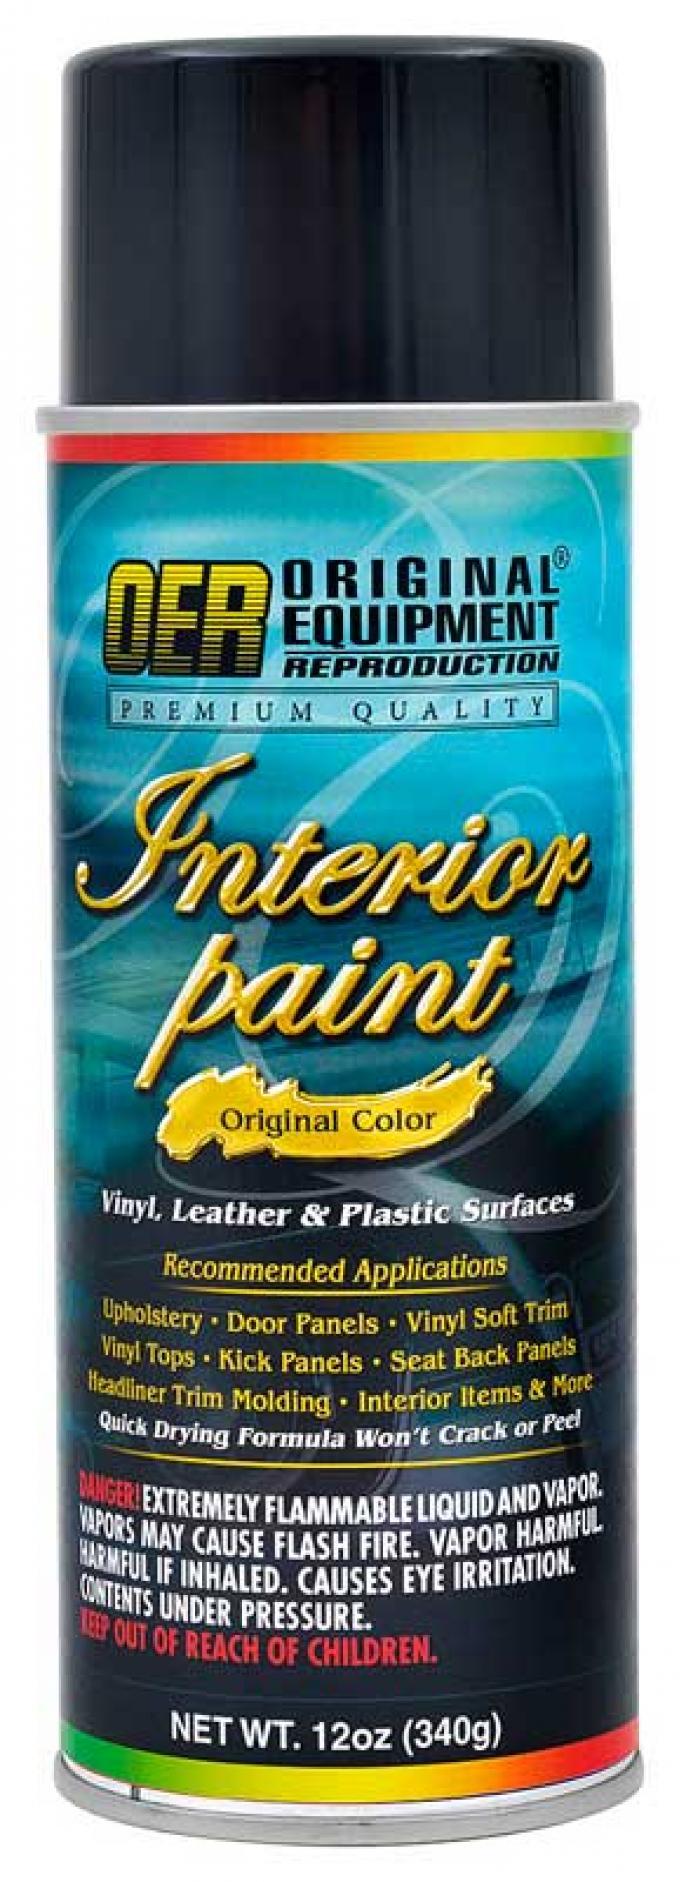 OER 1990 Mustang Vermillion Color Coat Spray 12 Oz. Aerosol Can PP934